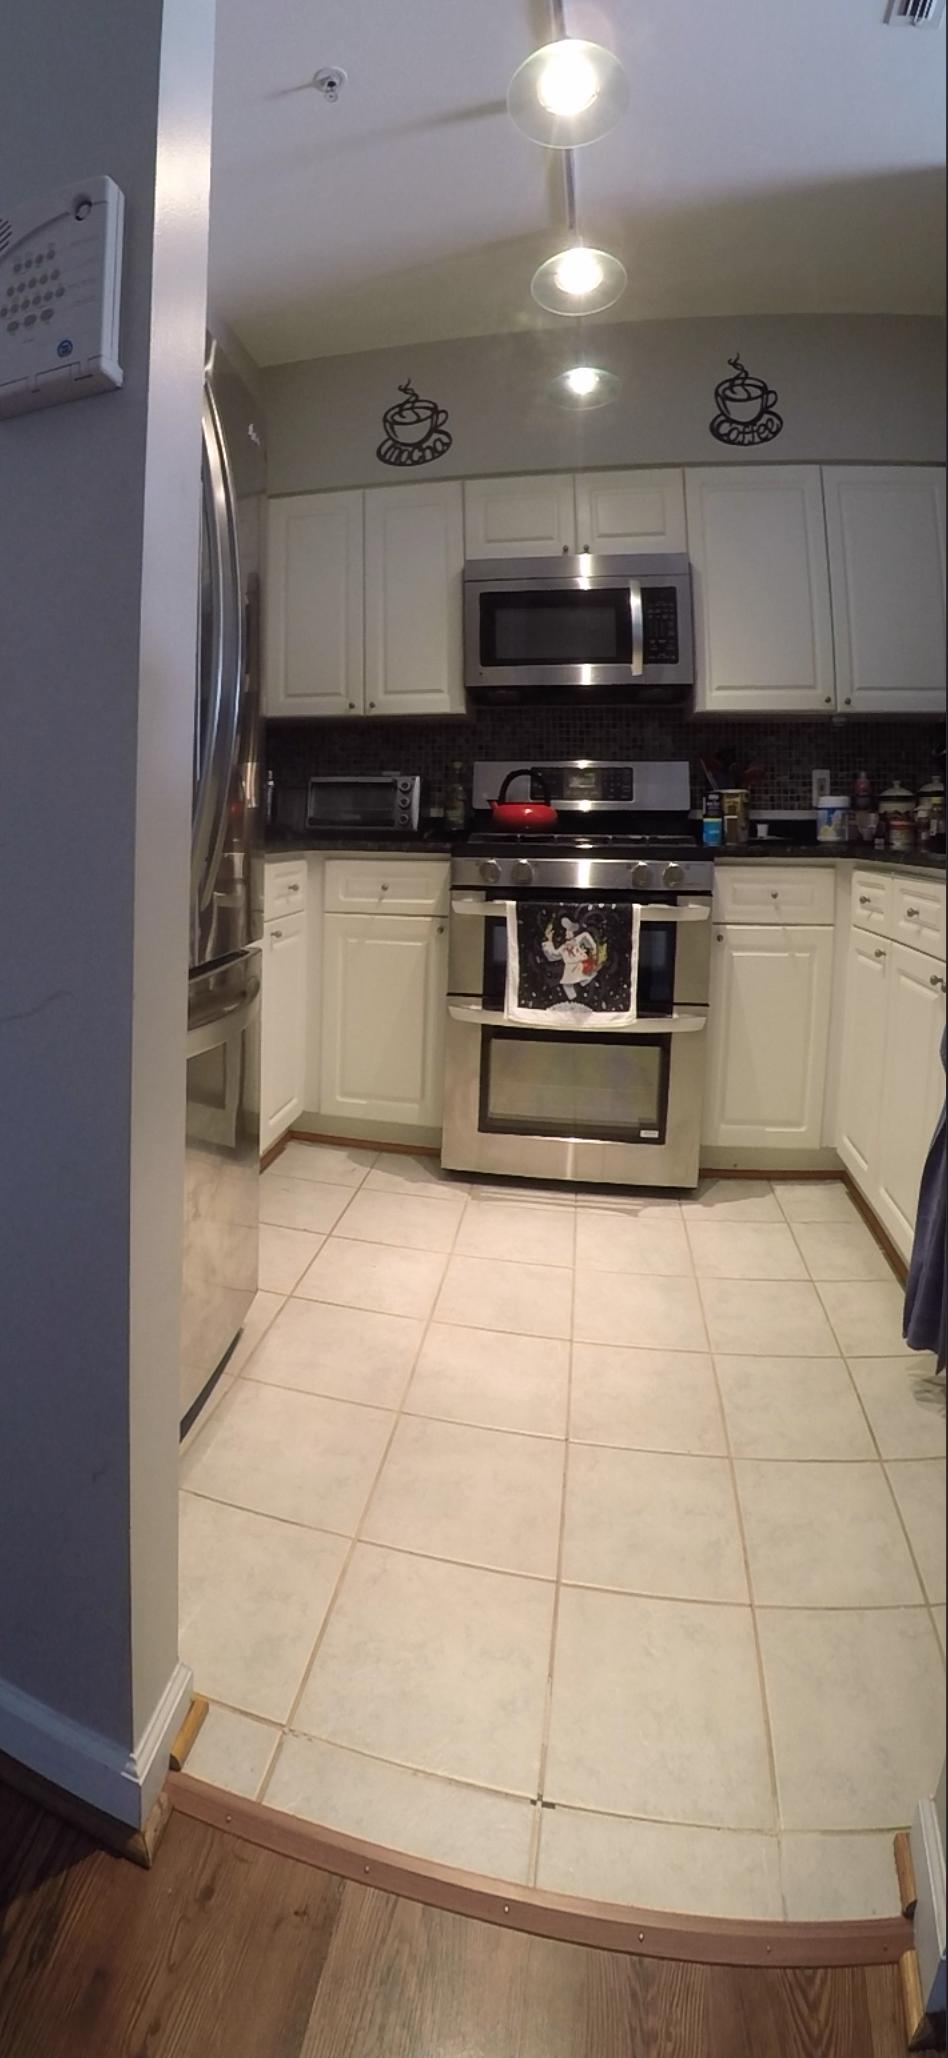 herndon worldgate kitchen floor before.png